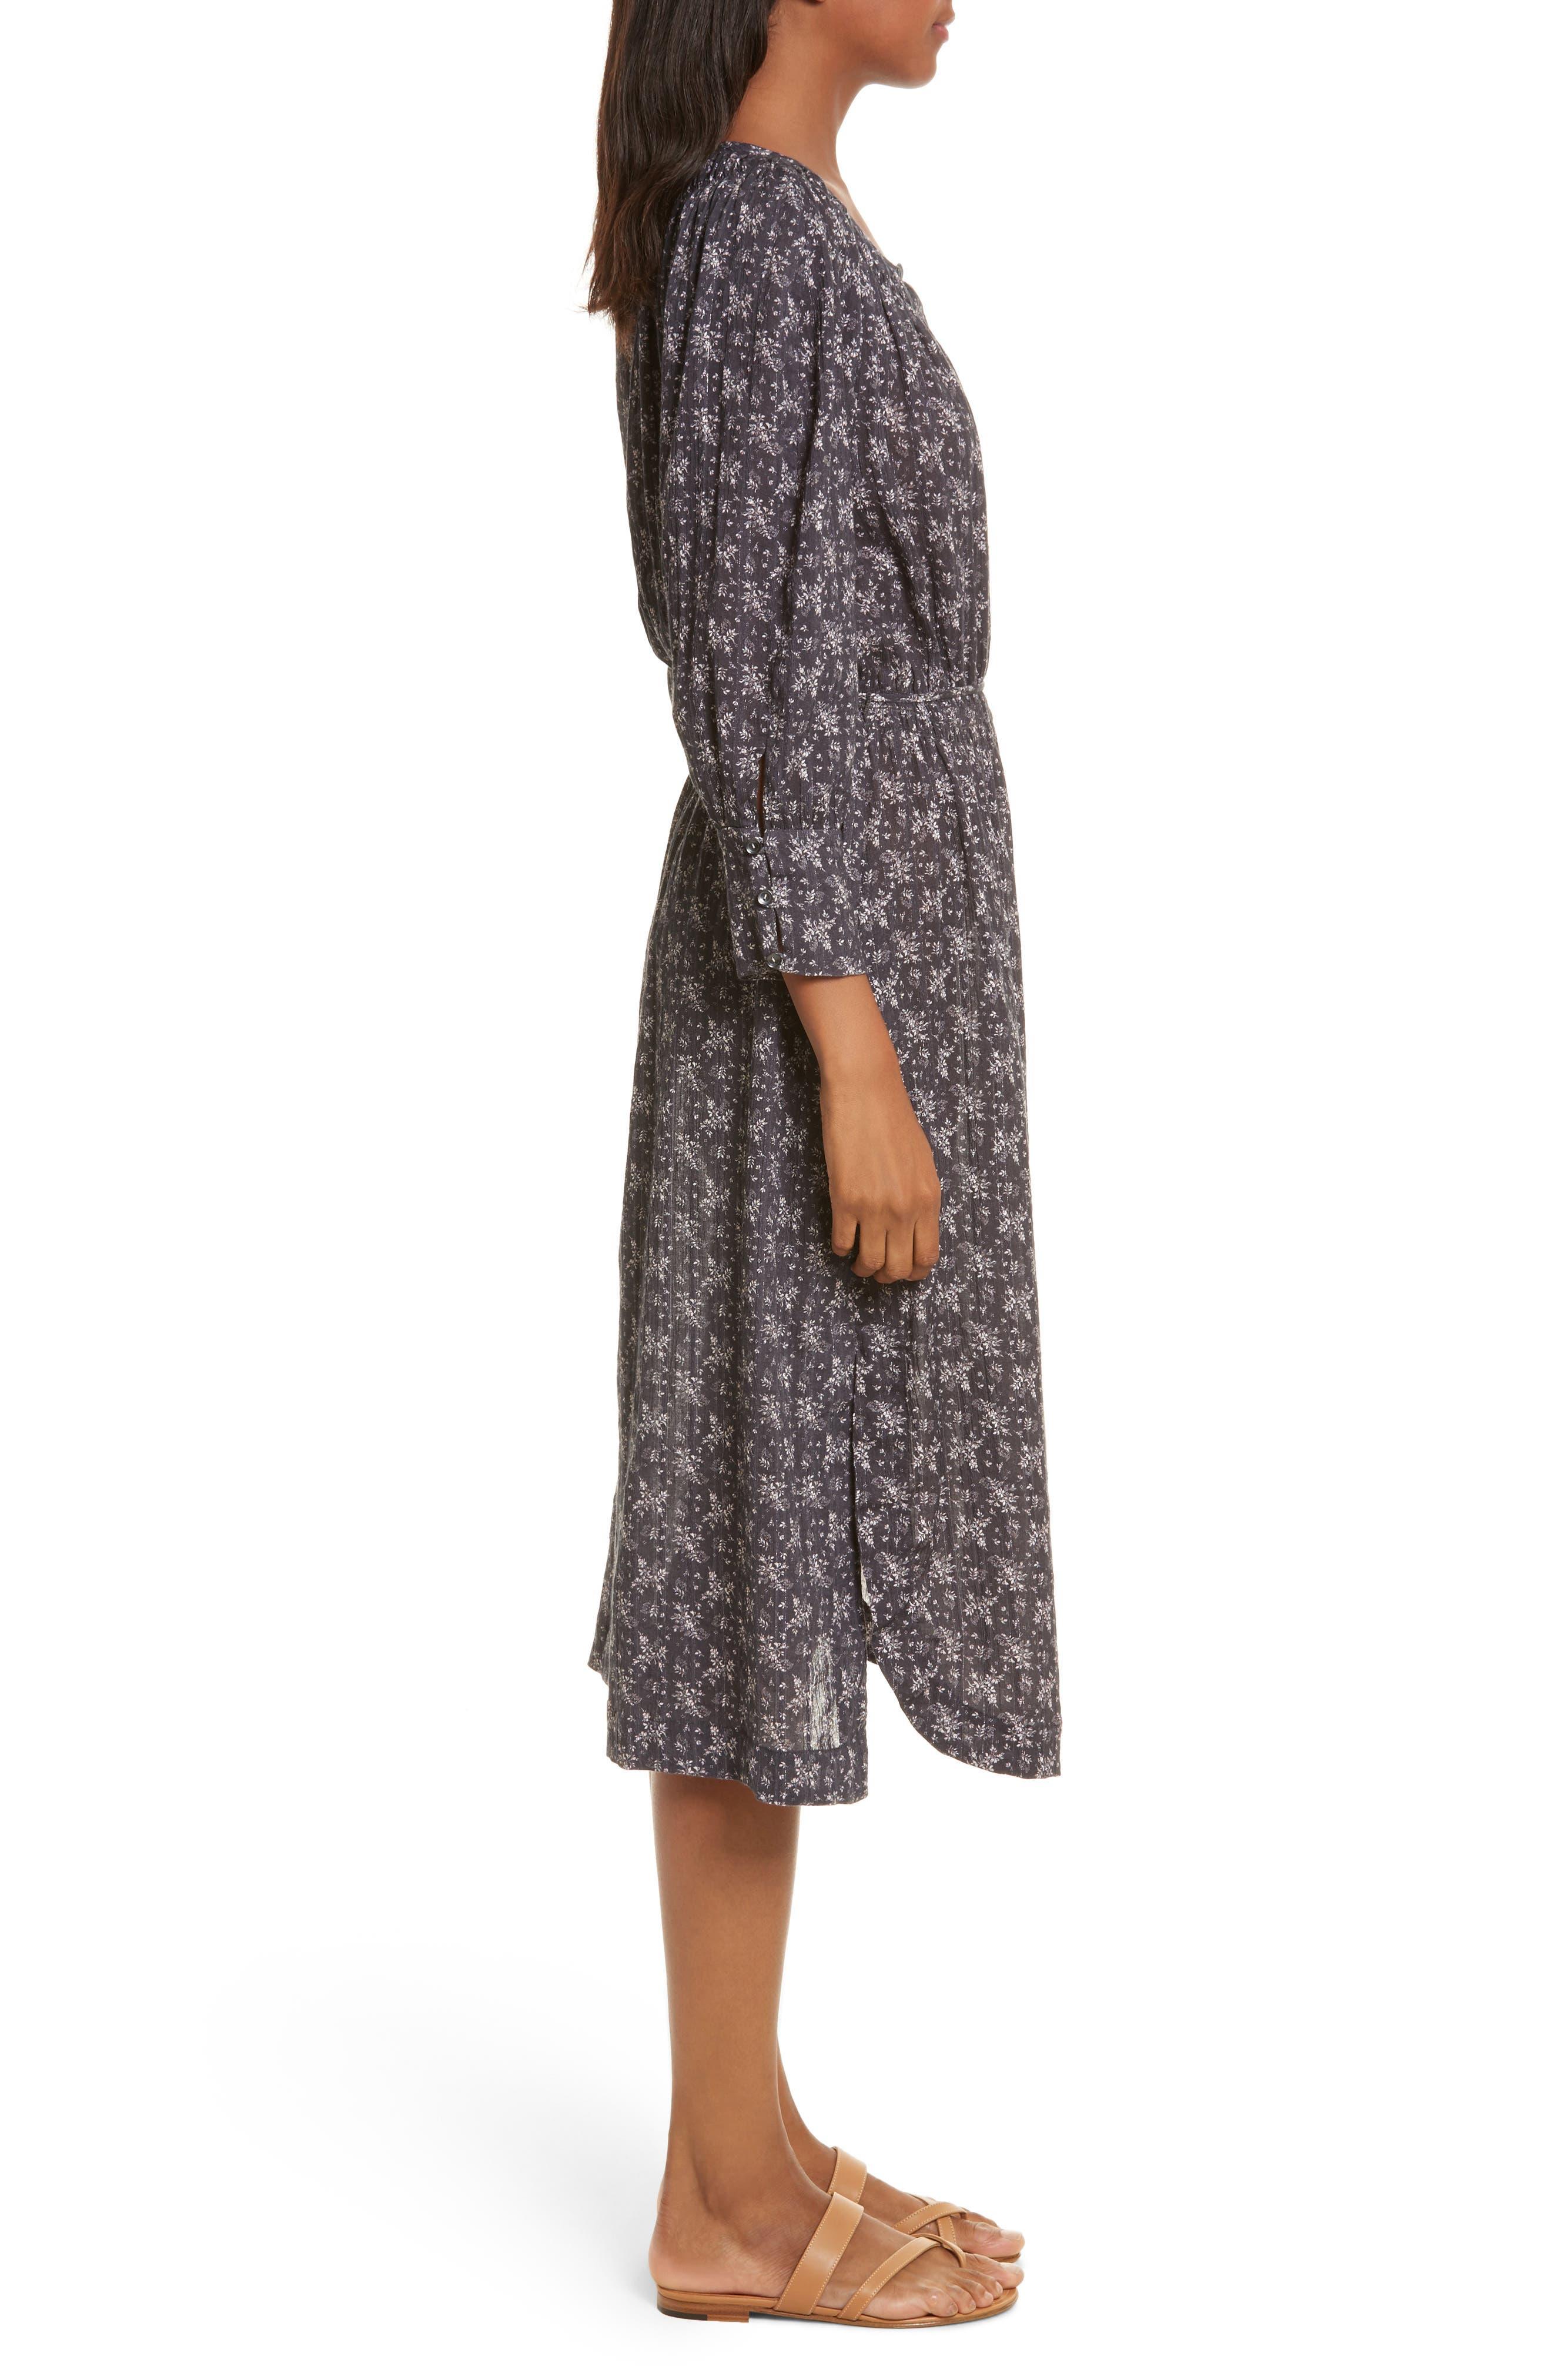 Angelique Long Sleeve Dress,                             Alternate thumbnail 3, color,                             014